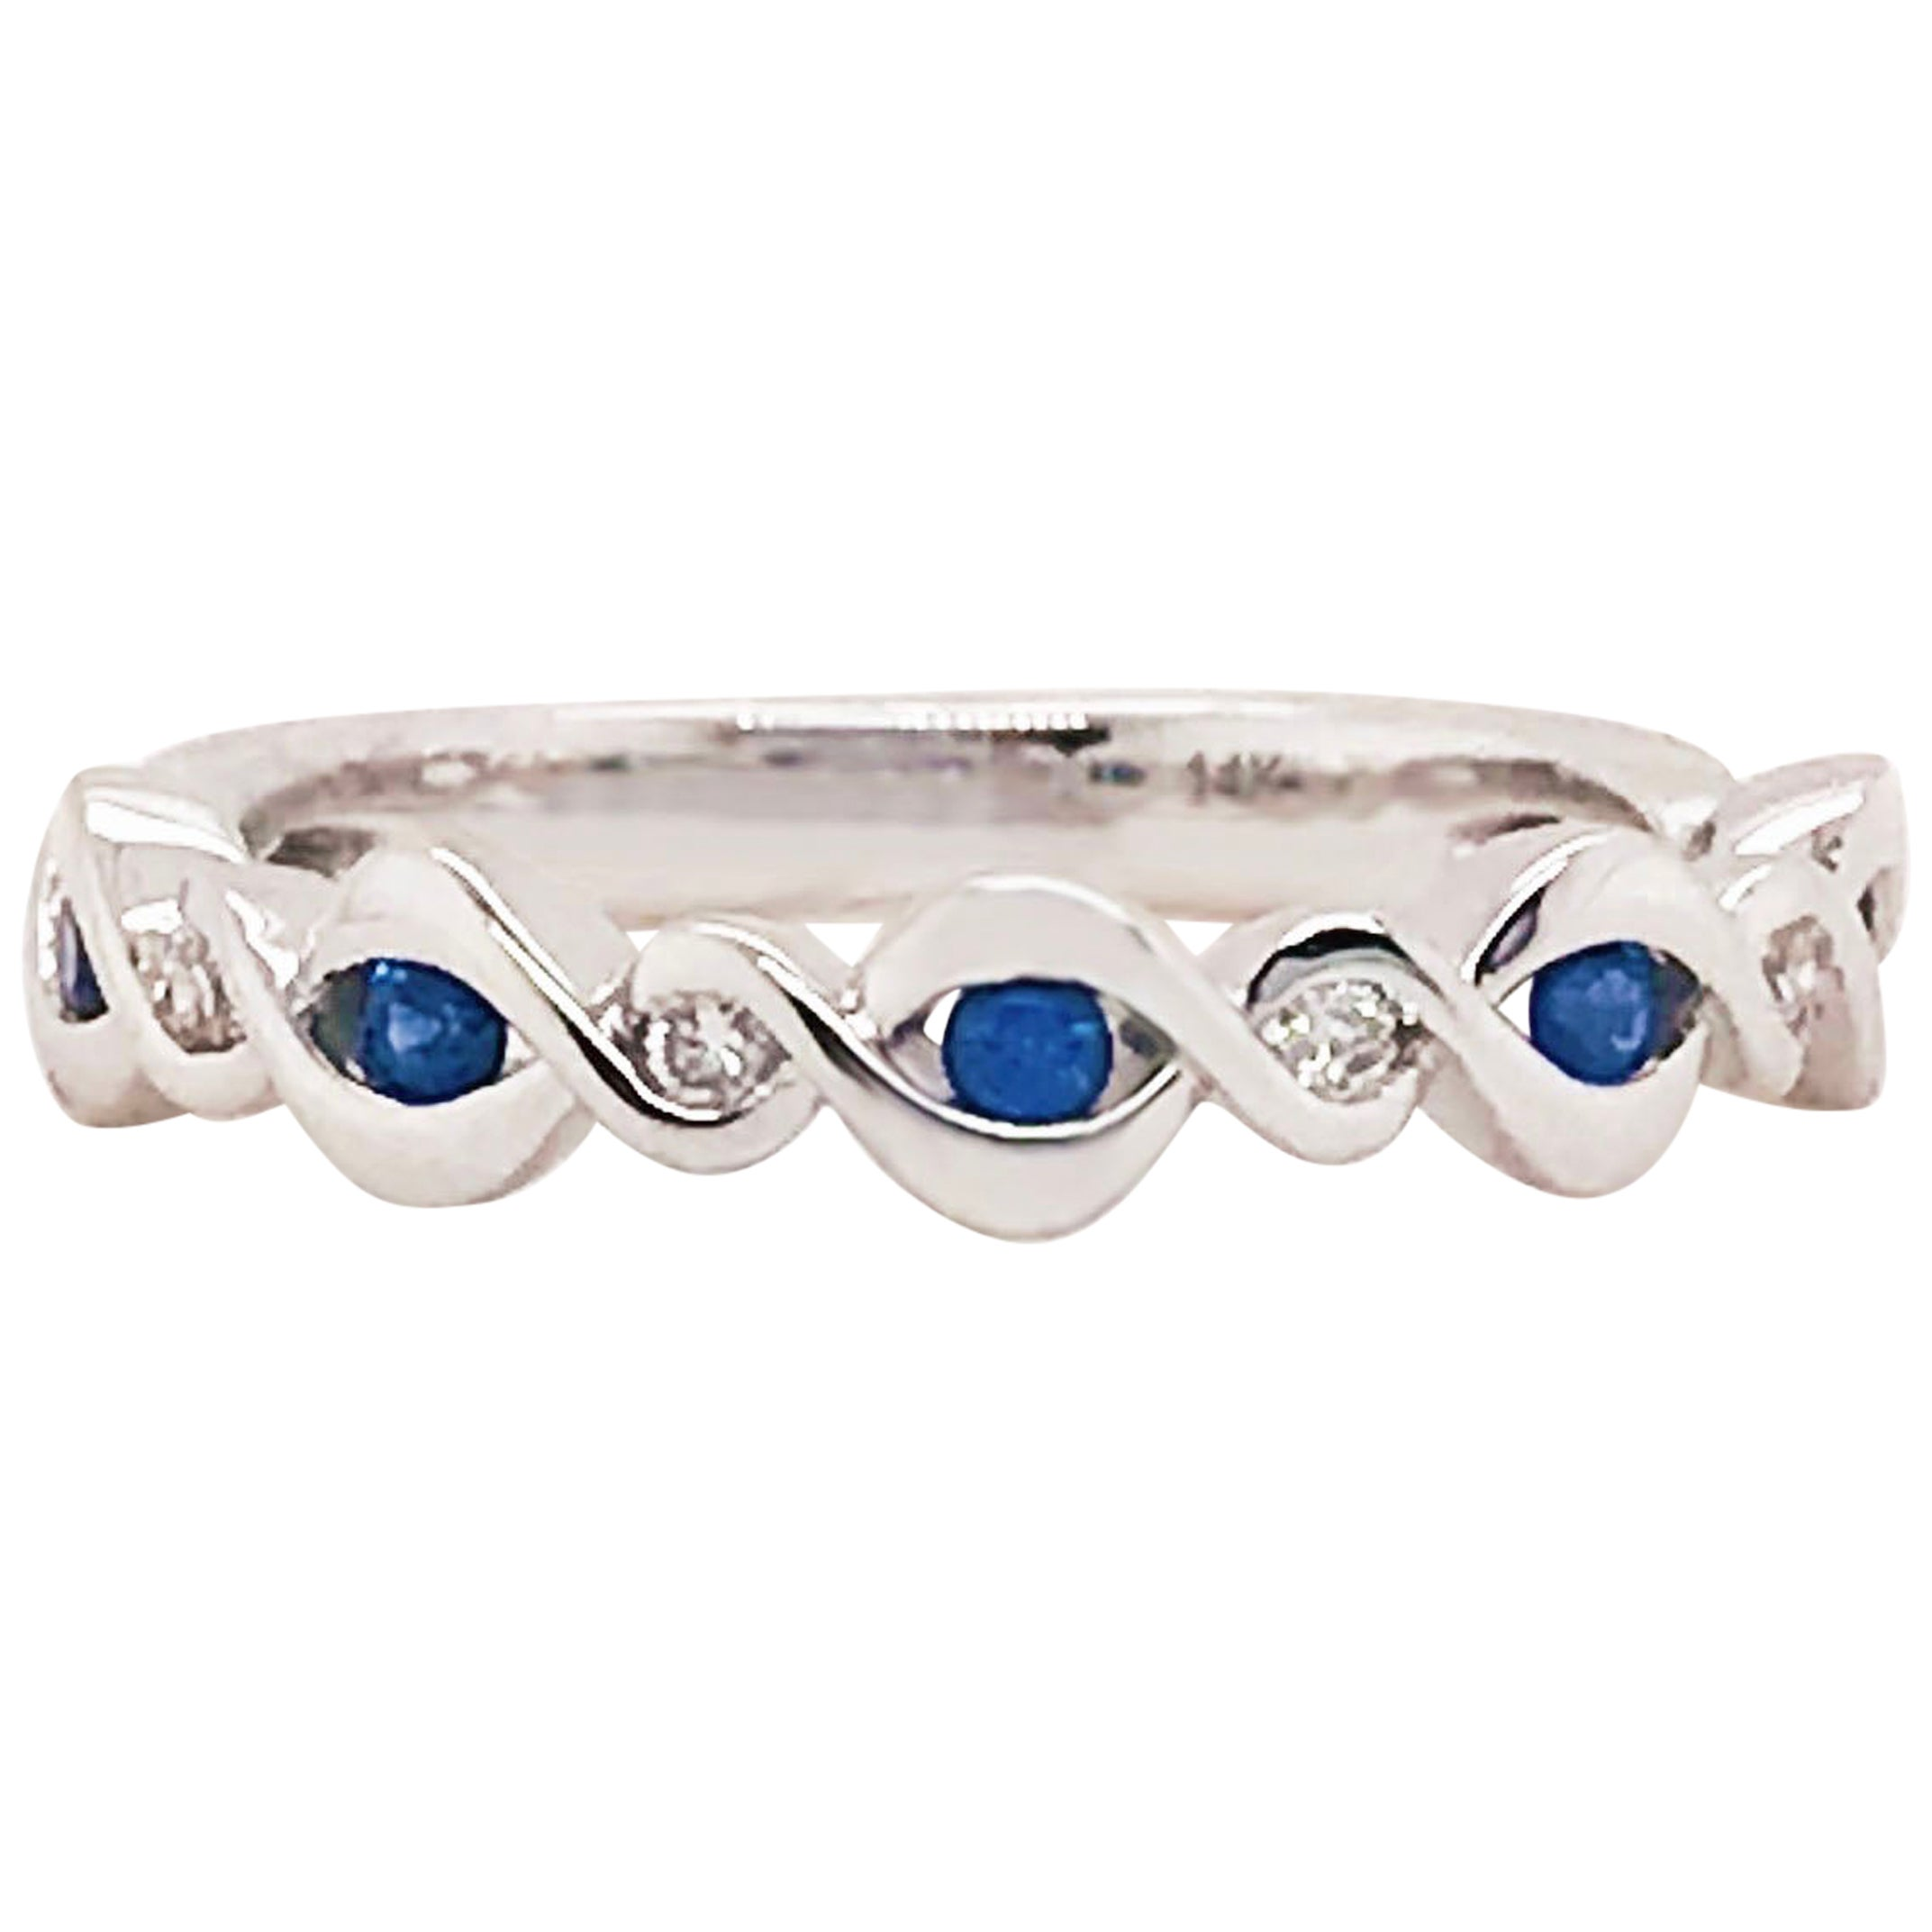 Sapphire and Diamond Infinity Band, 14 Karat Gold Blue Sapphire and Diamond Ring